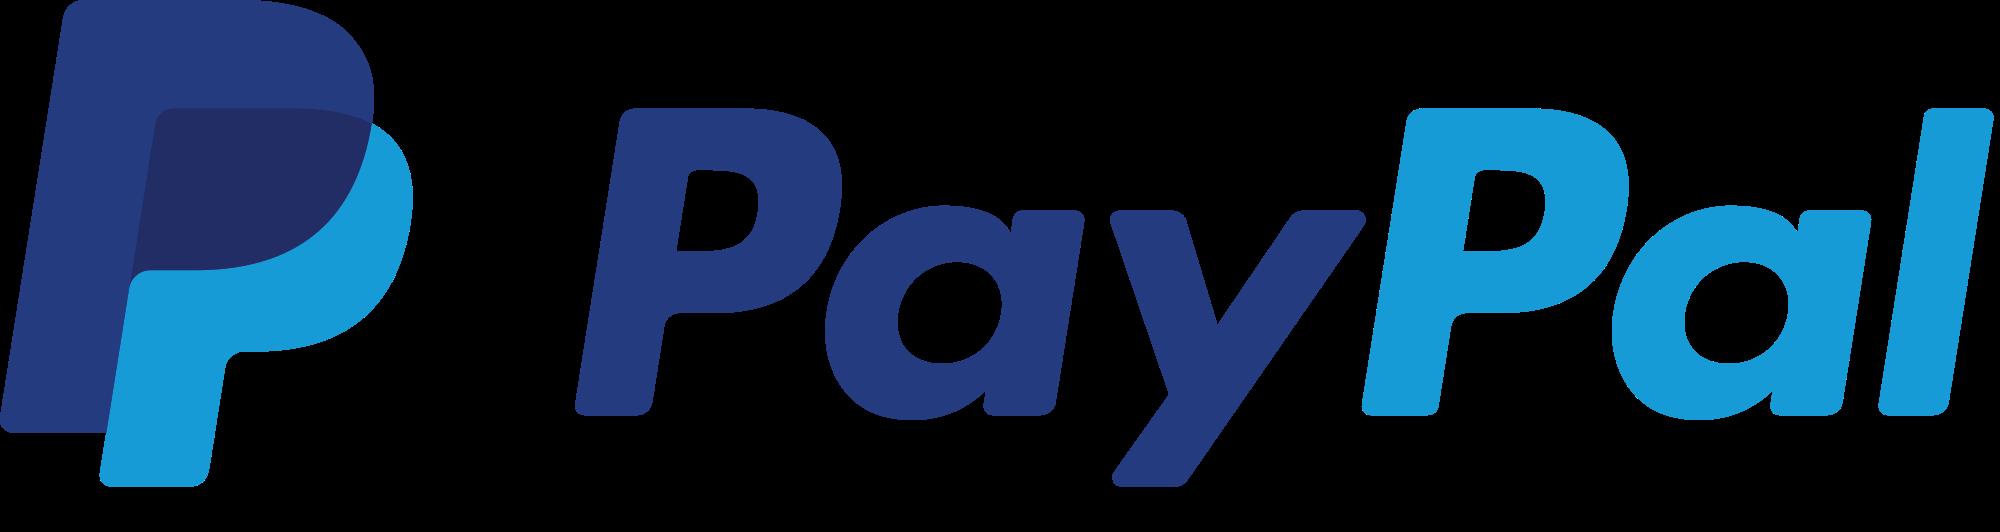 PayPal Spenden